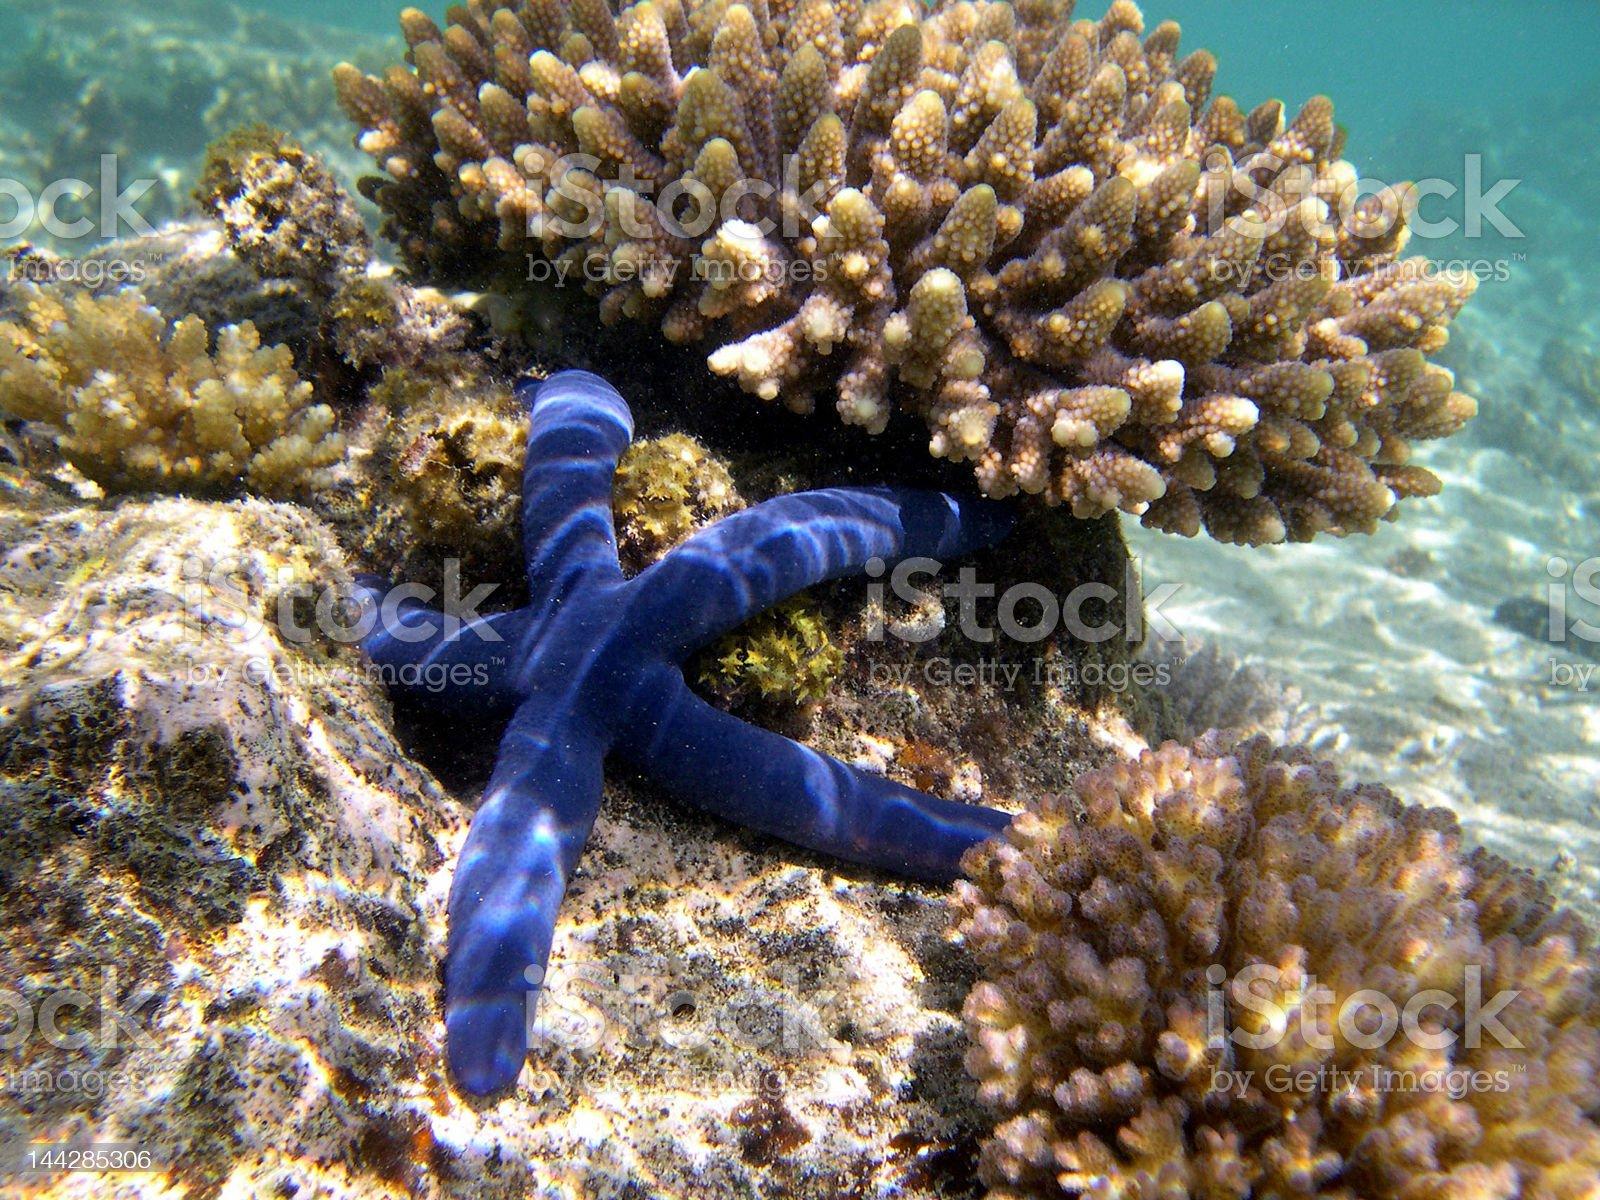 blue starfish royalty-free stock photo